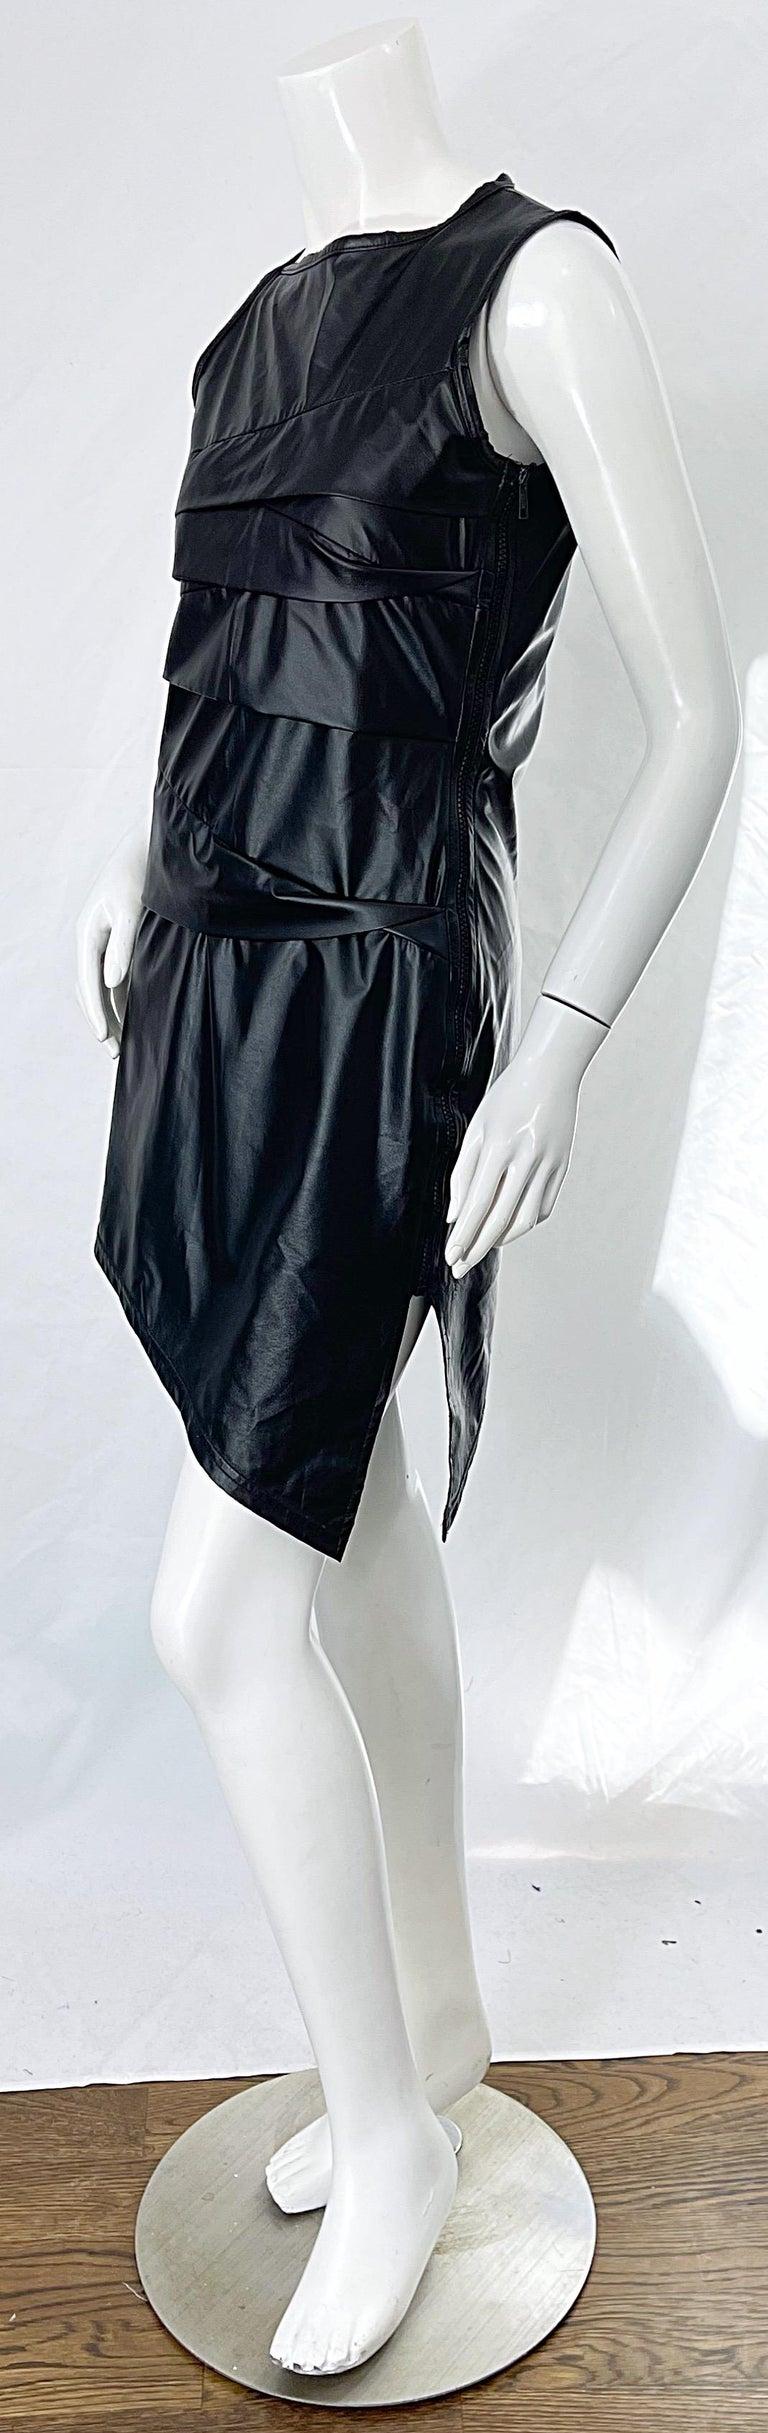 1990s Dexter Wong Club Kid Rave Japanese Black Pleather Vintage 90s Mini Dress For Sale 1